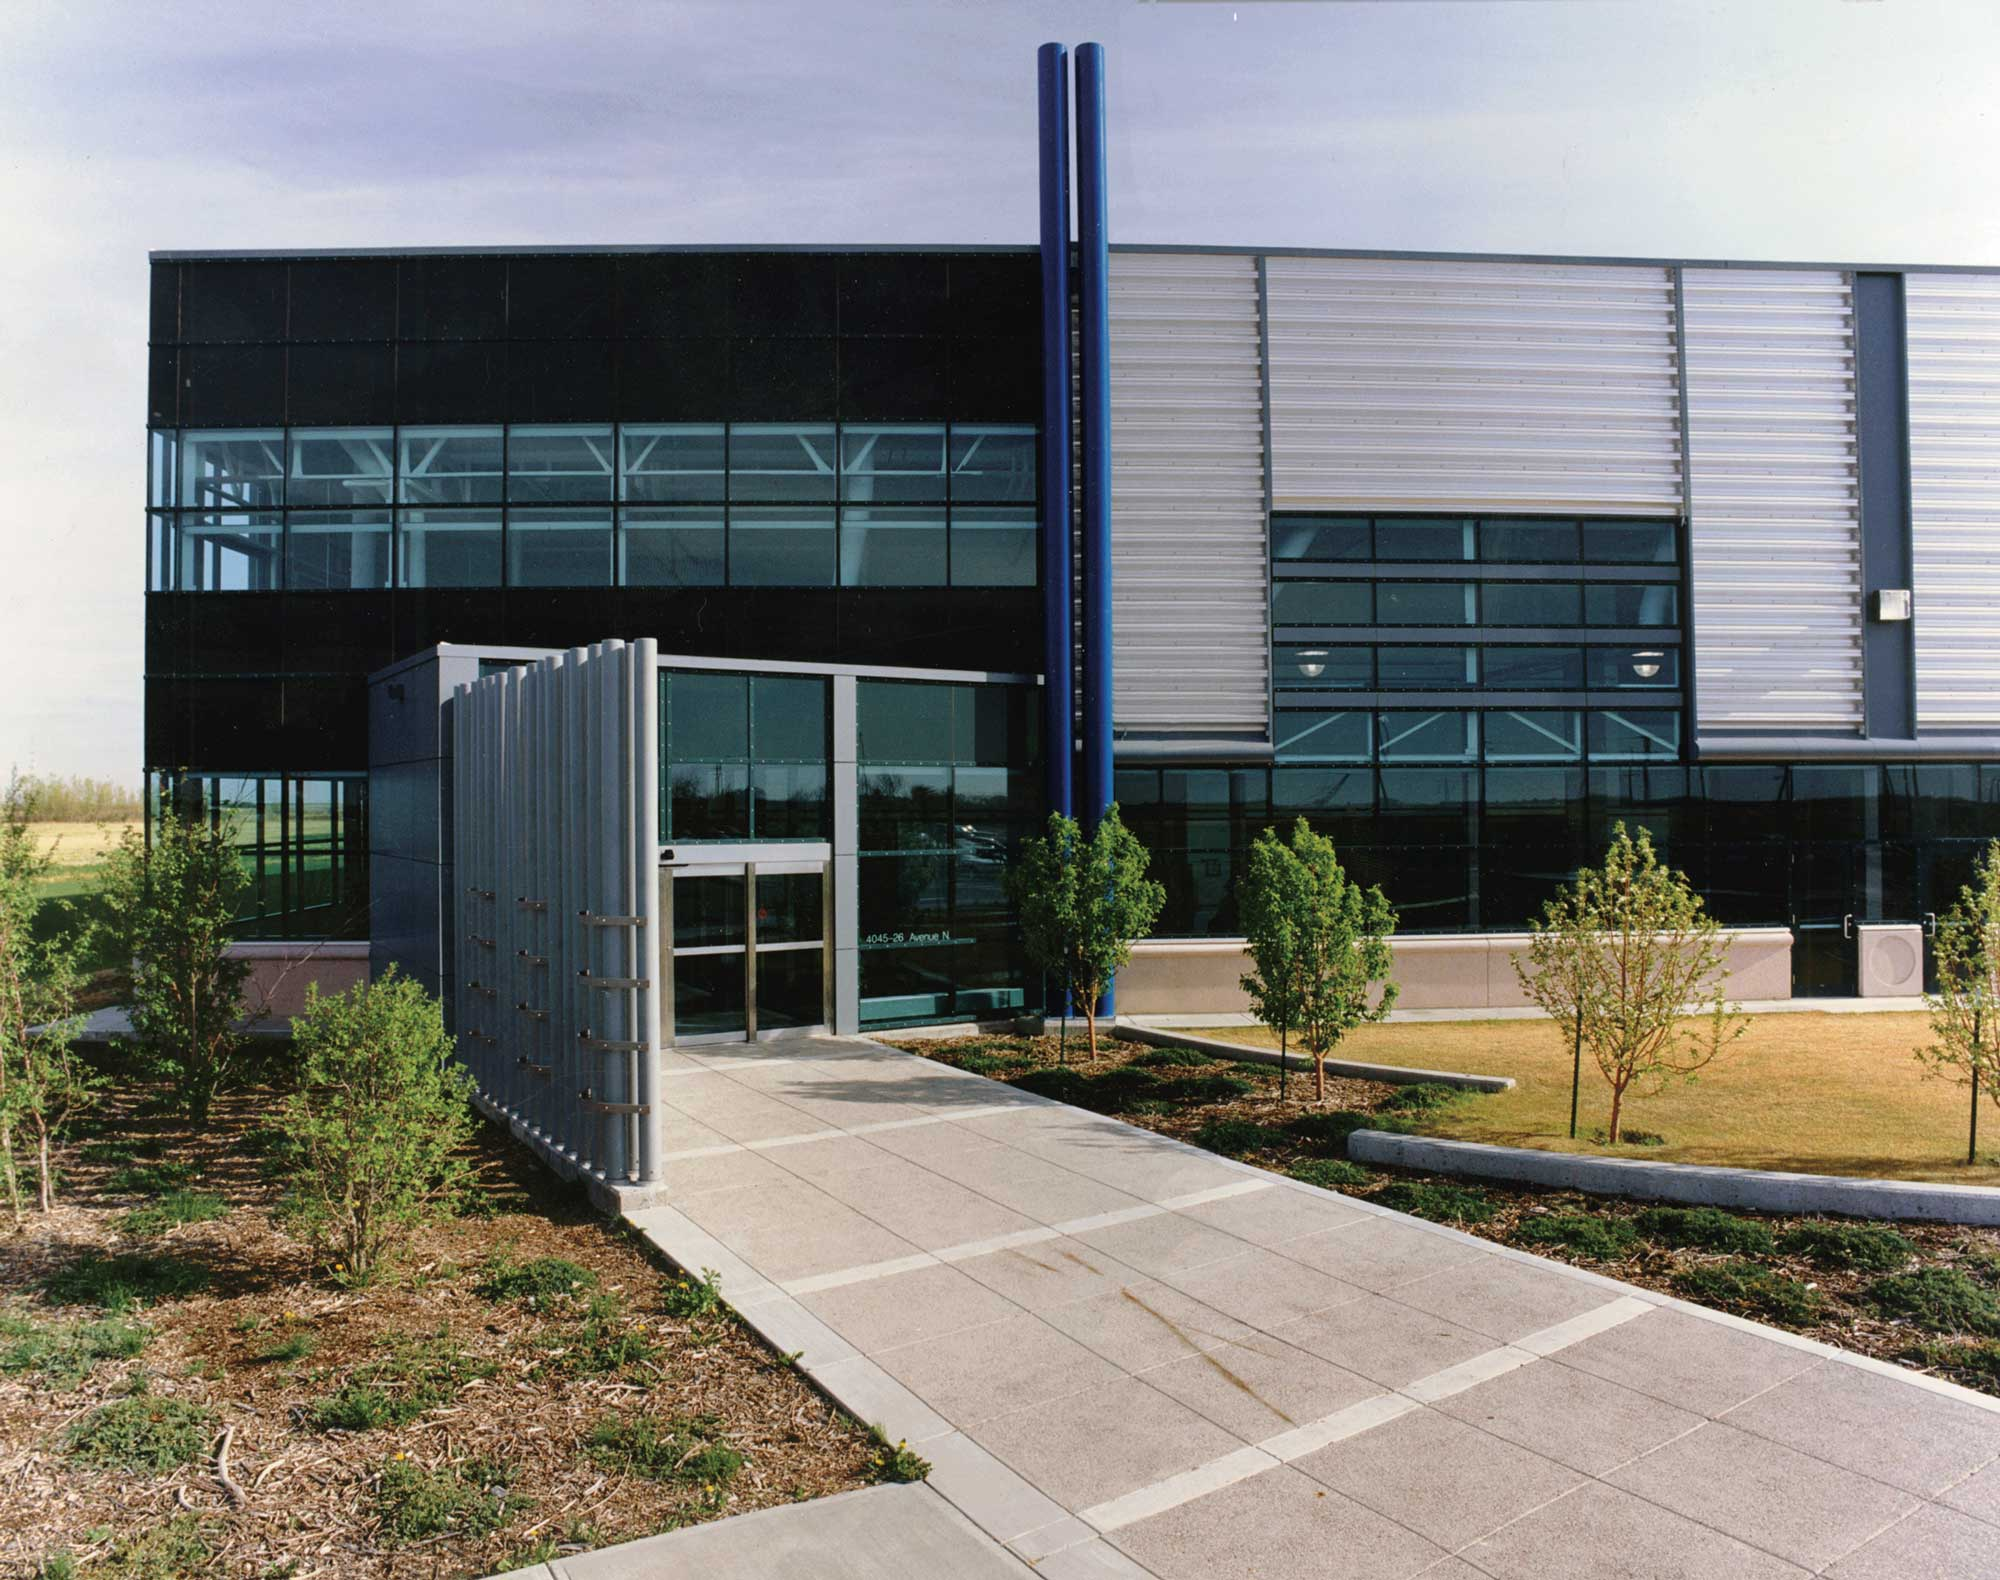 Pratt and Whitney Engine Assembly Plant